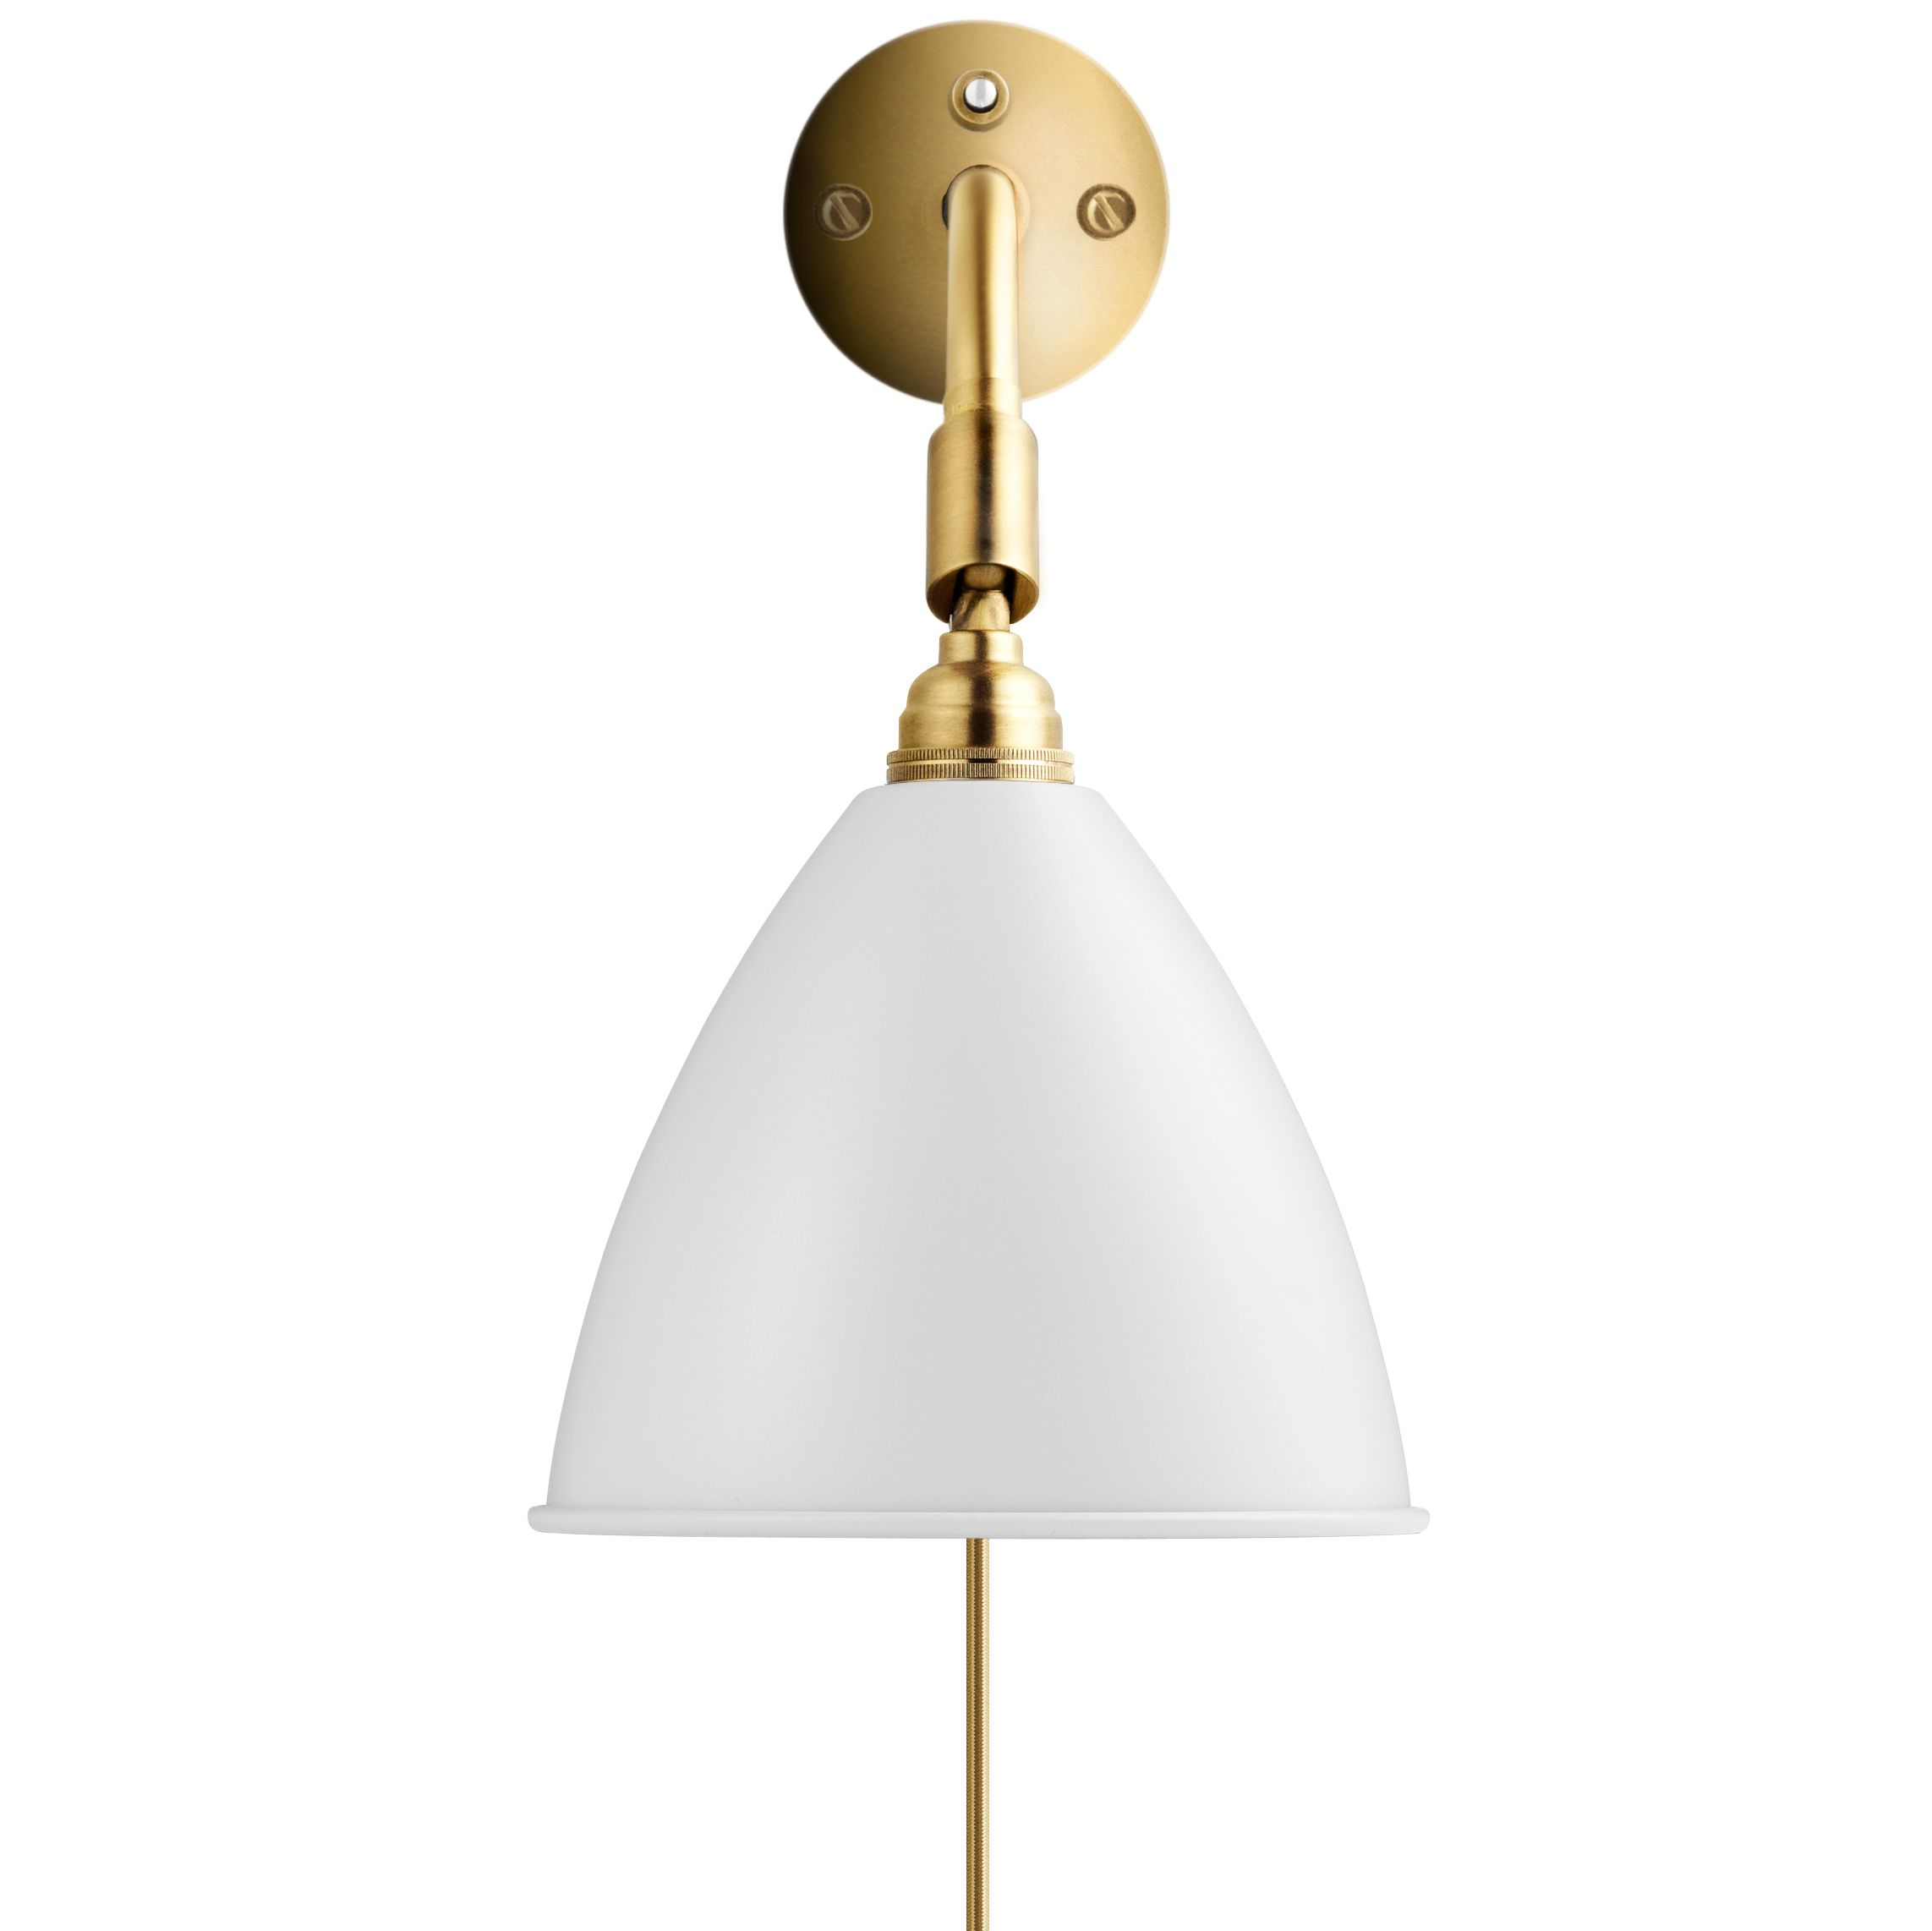 Gubi Bestlite BL7 wandlamp wit/messing met stekker